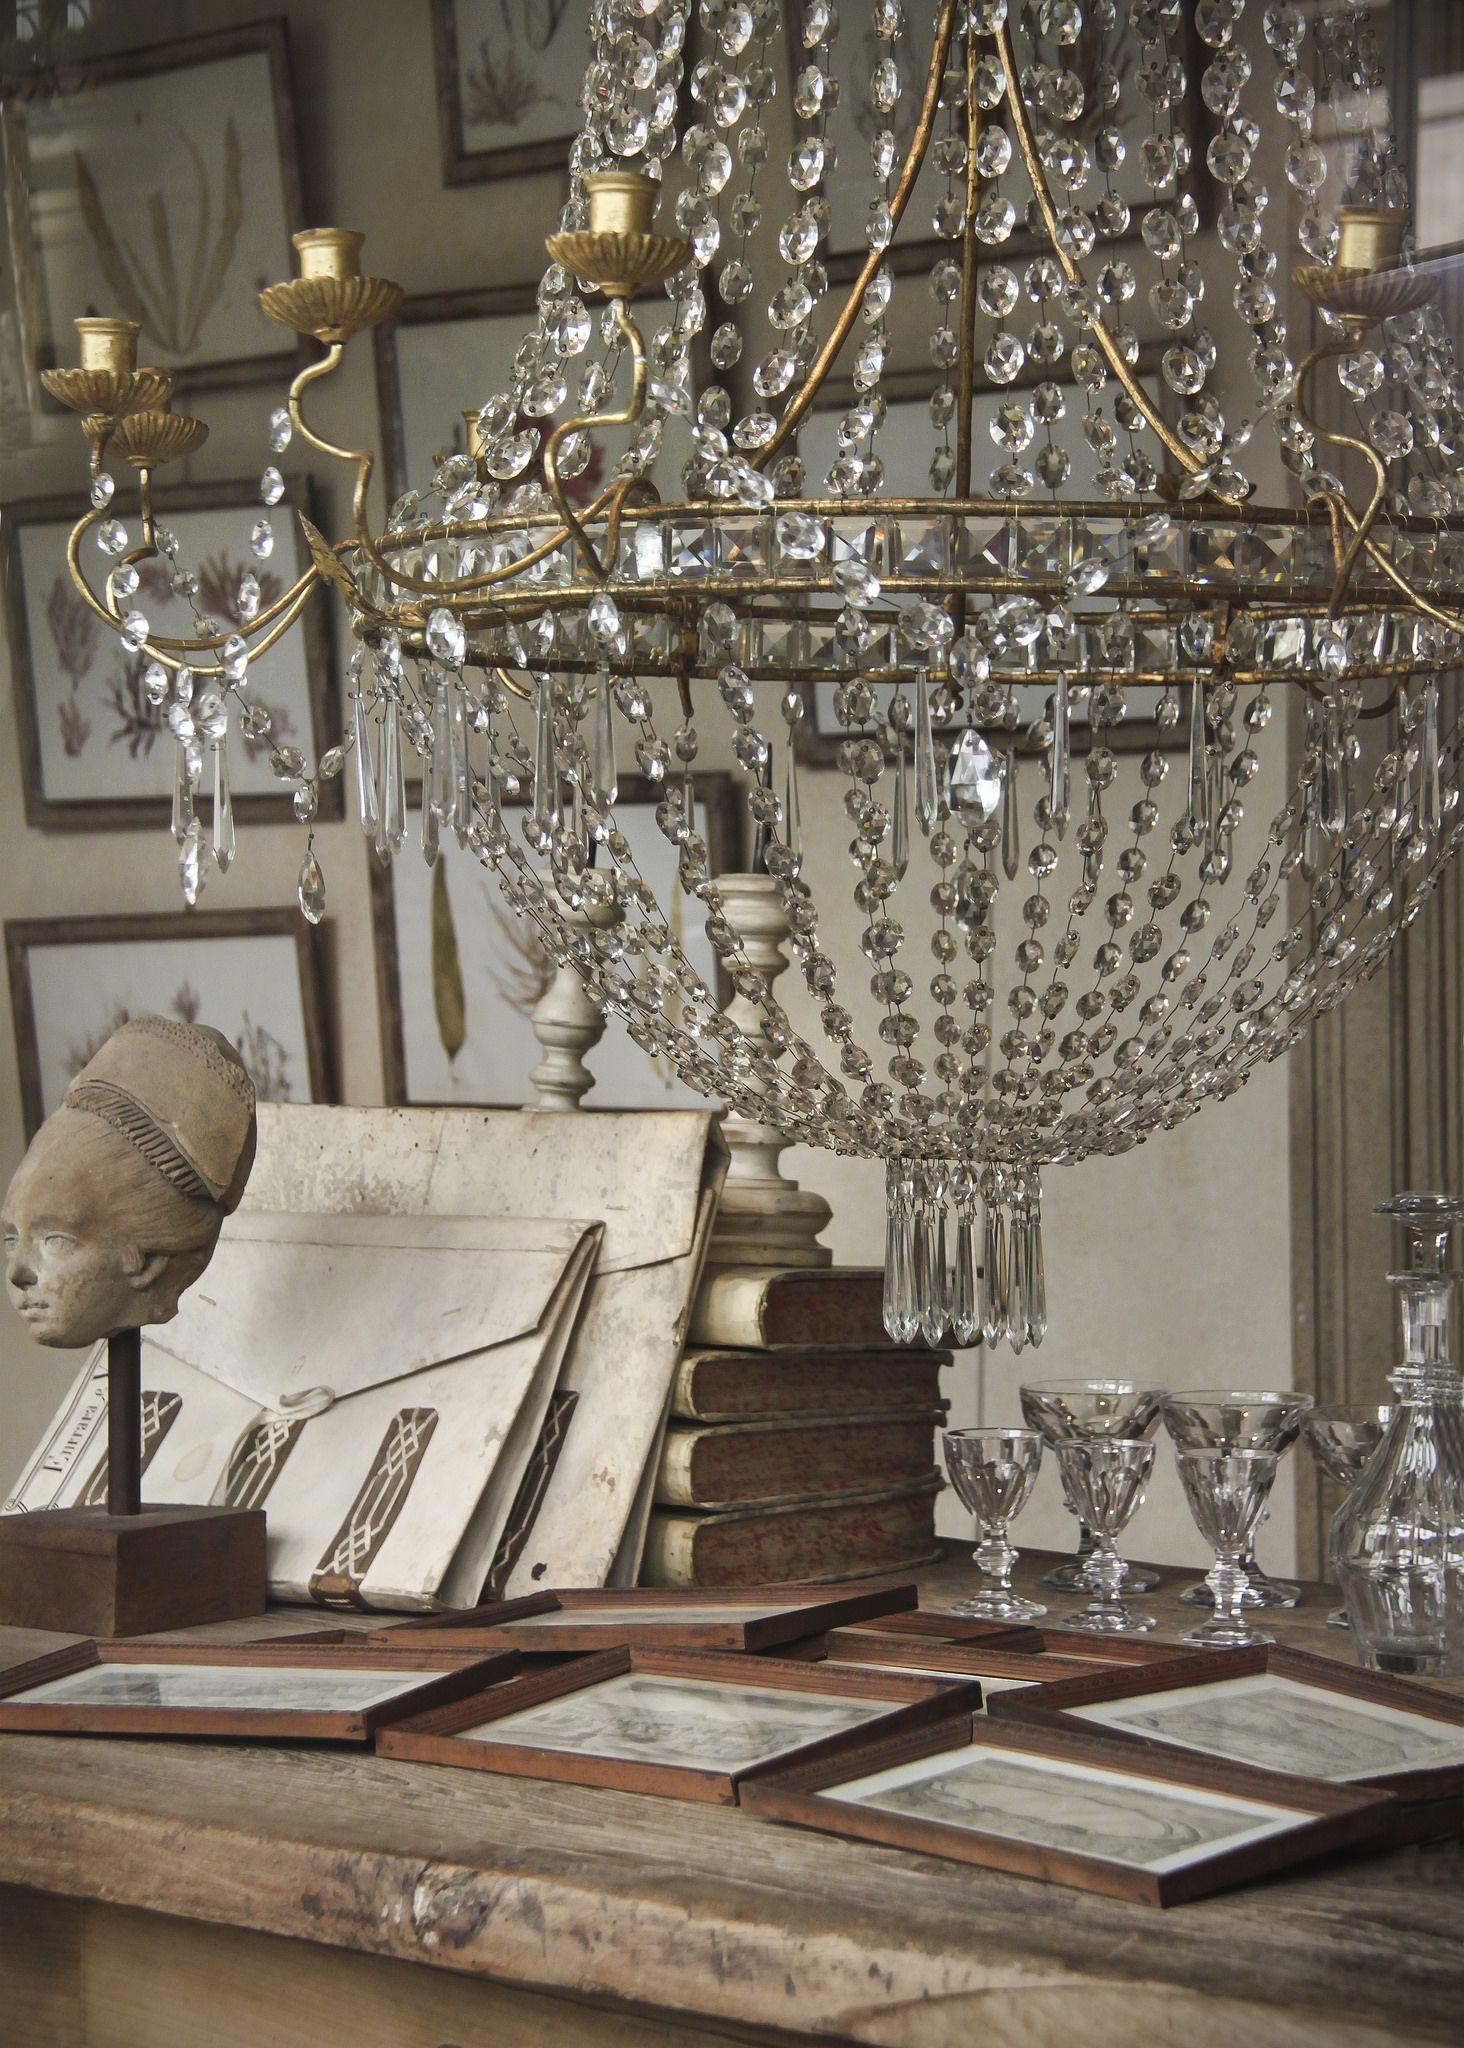 in paris shop window chandy love pinterest brocante. Black Bedroom Furniture Sets. Home Design Ideas